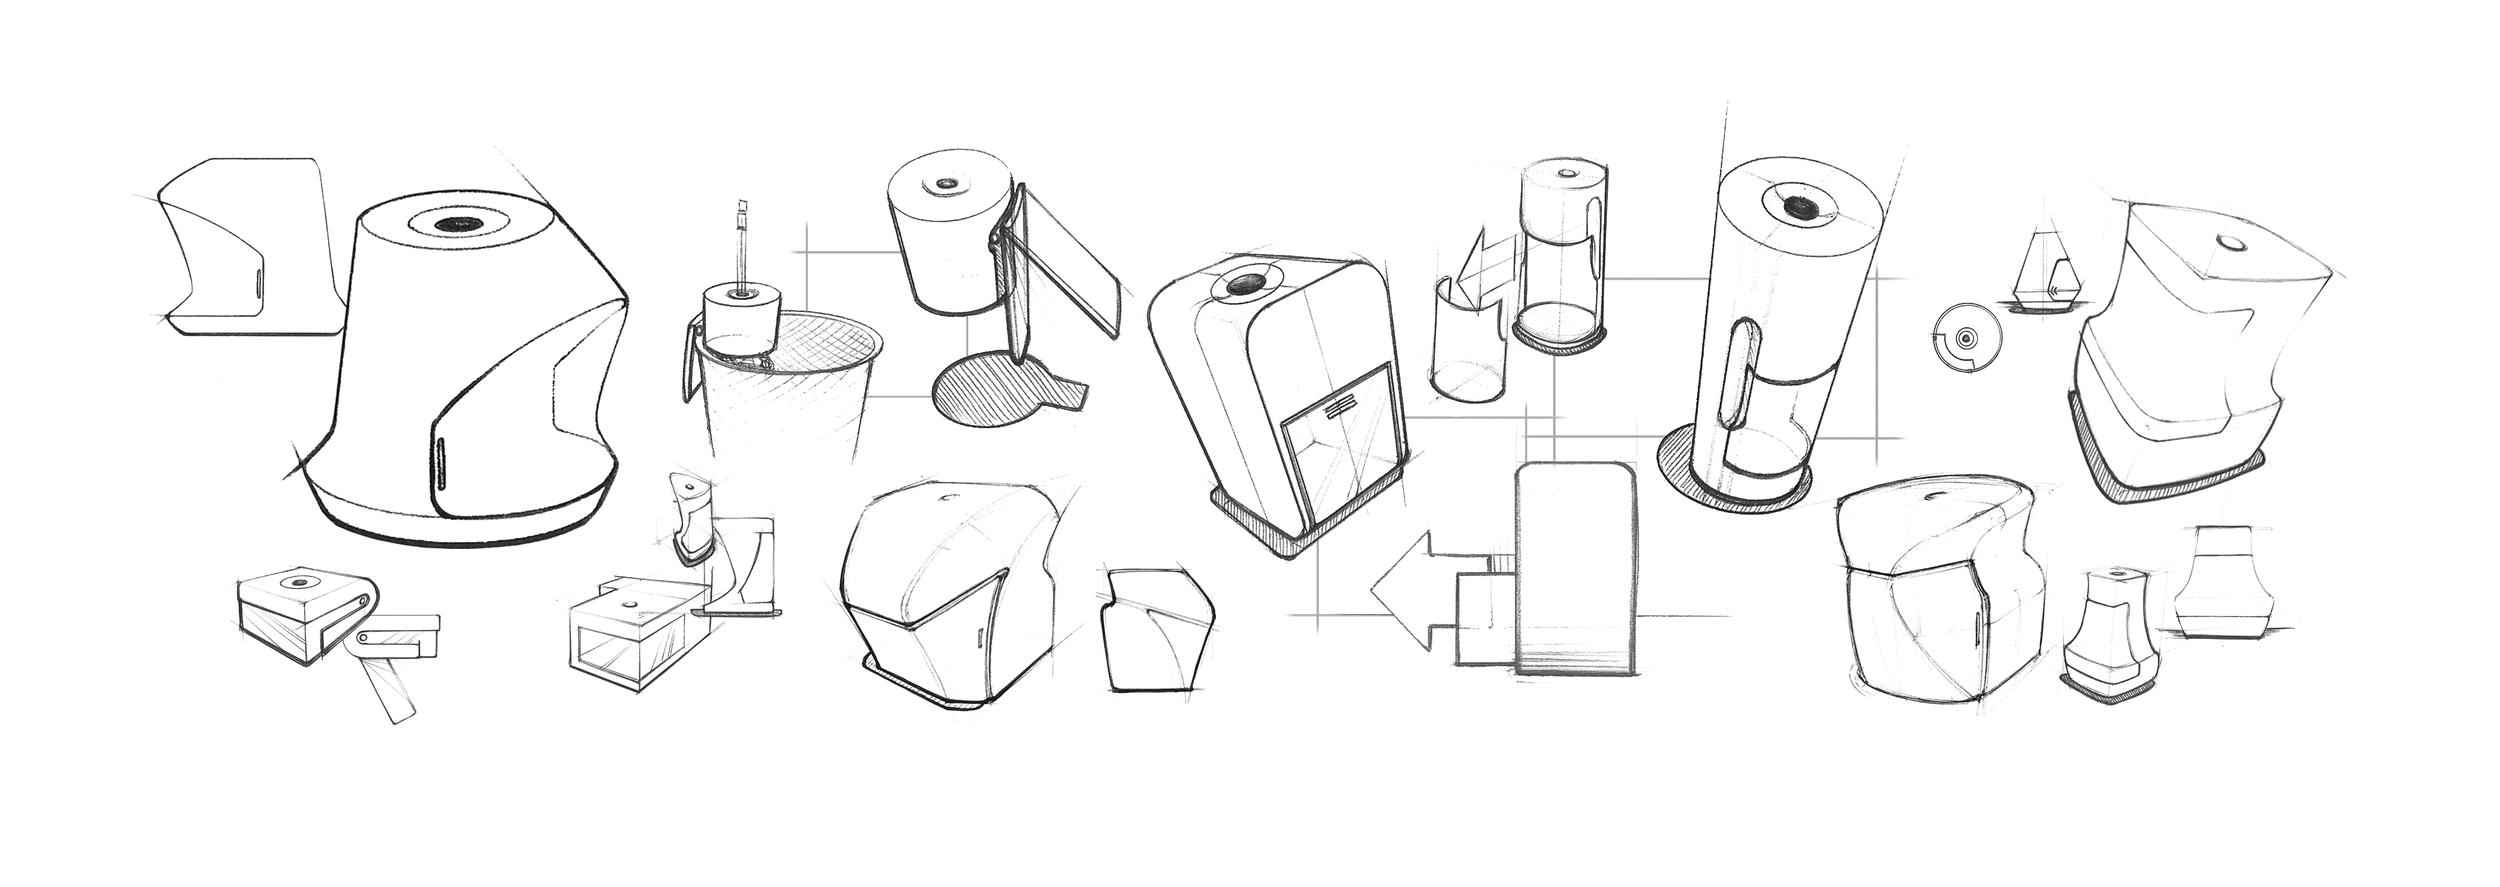 Verge Sketch Page 5 (BW).png